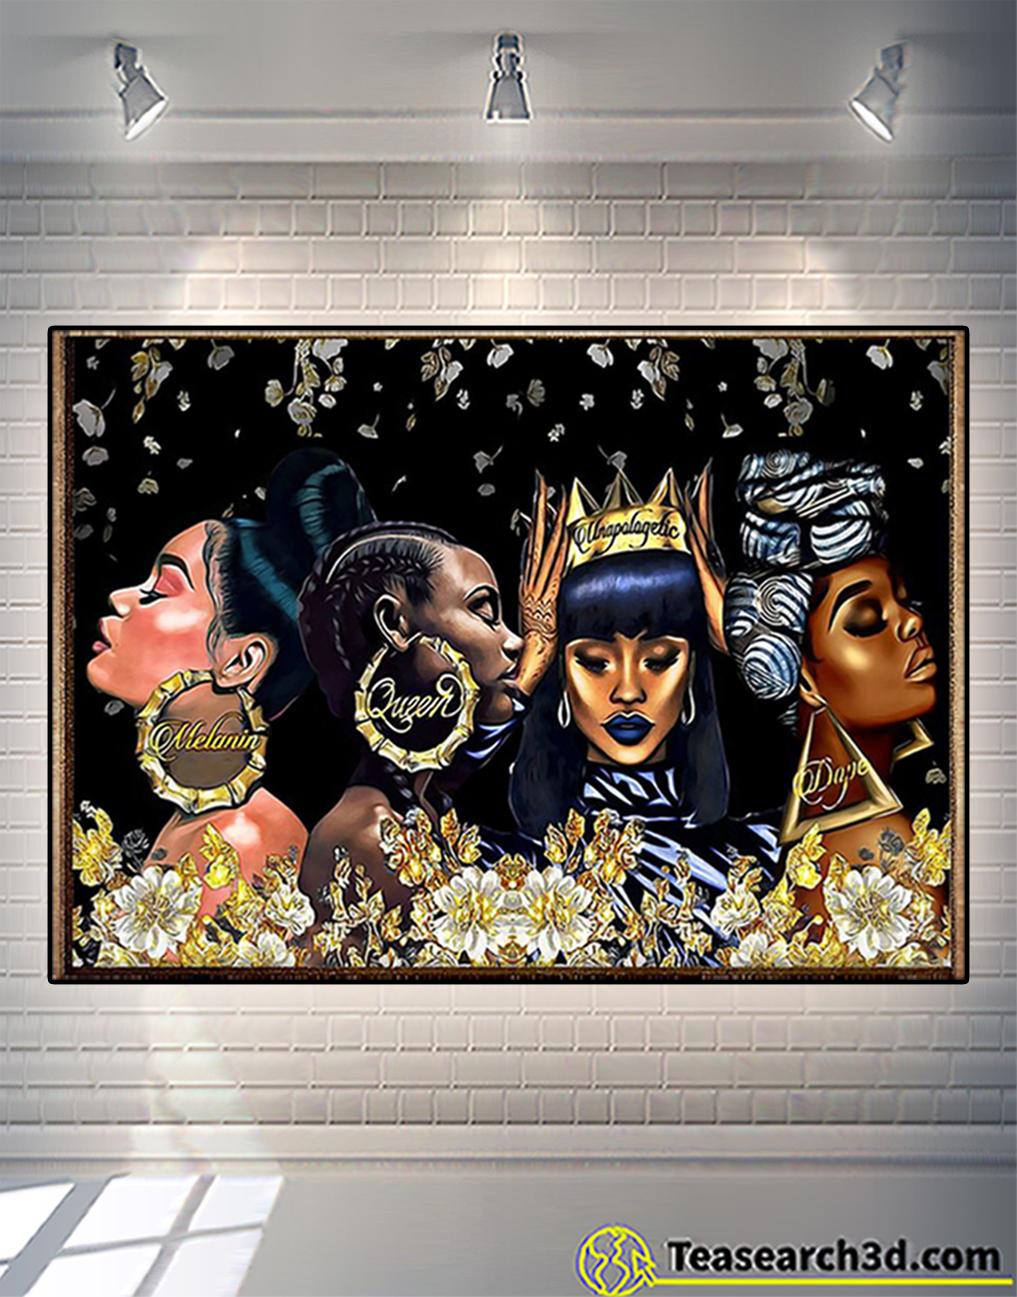 Black woman melanin queen unapologetic dope poster